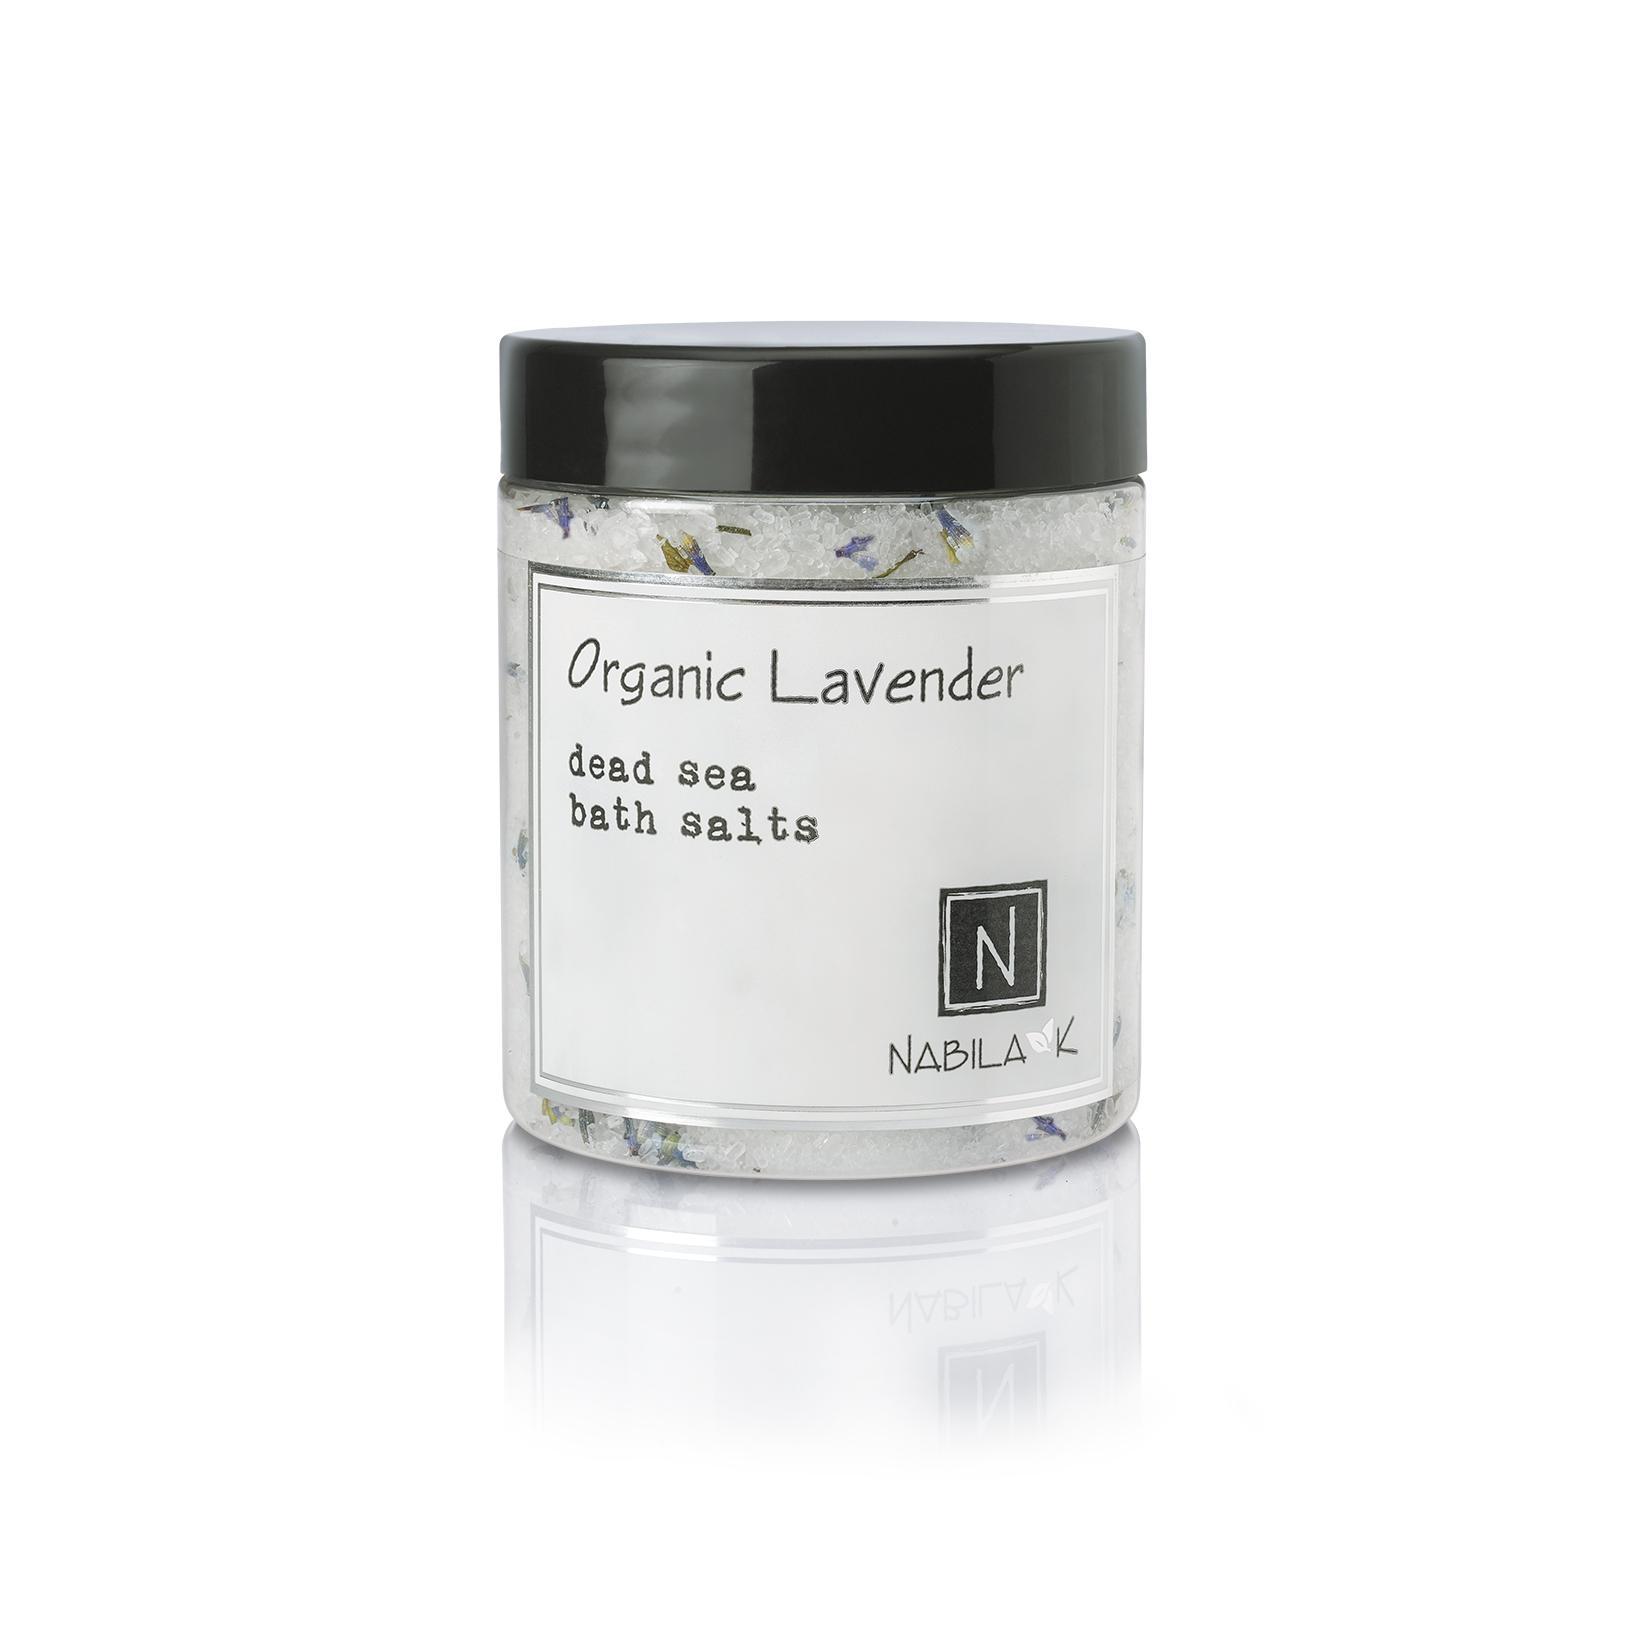 1 Large Sized Version of Nabila K's Organic Lavender Dead Sea Bath Salts